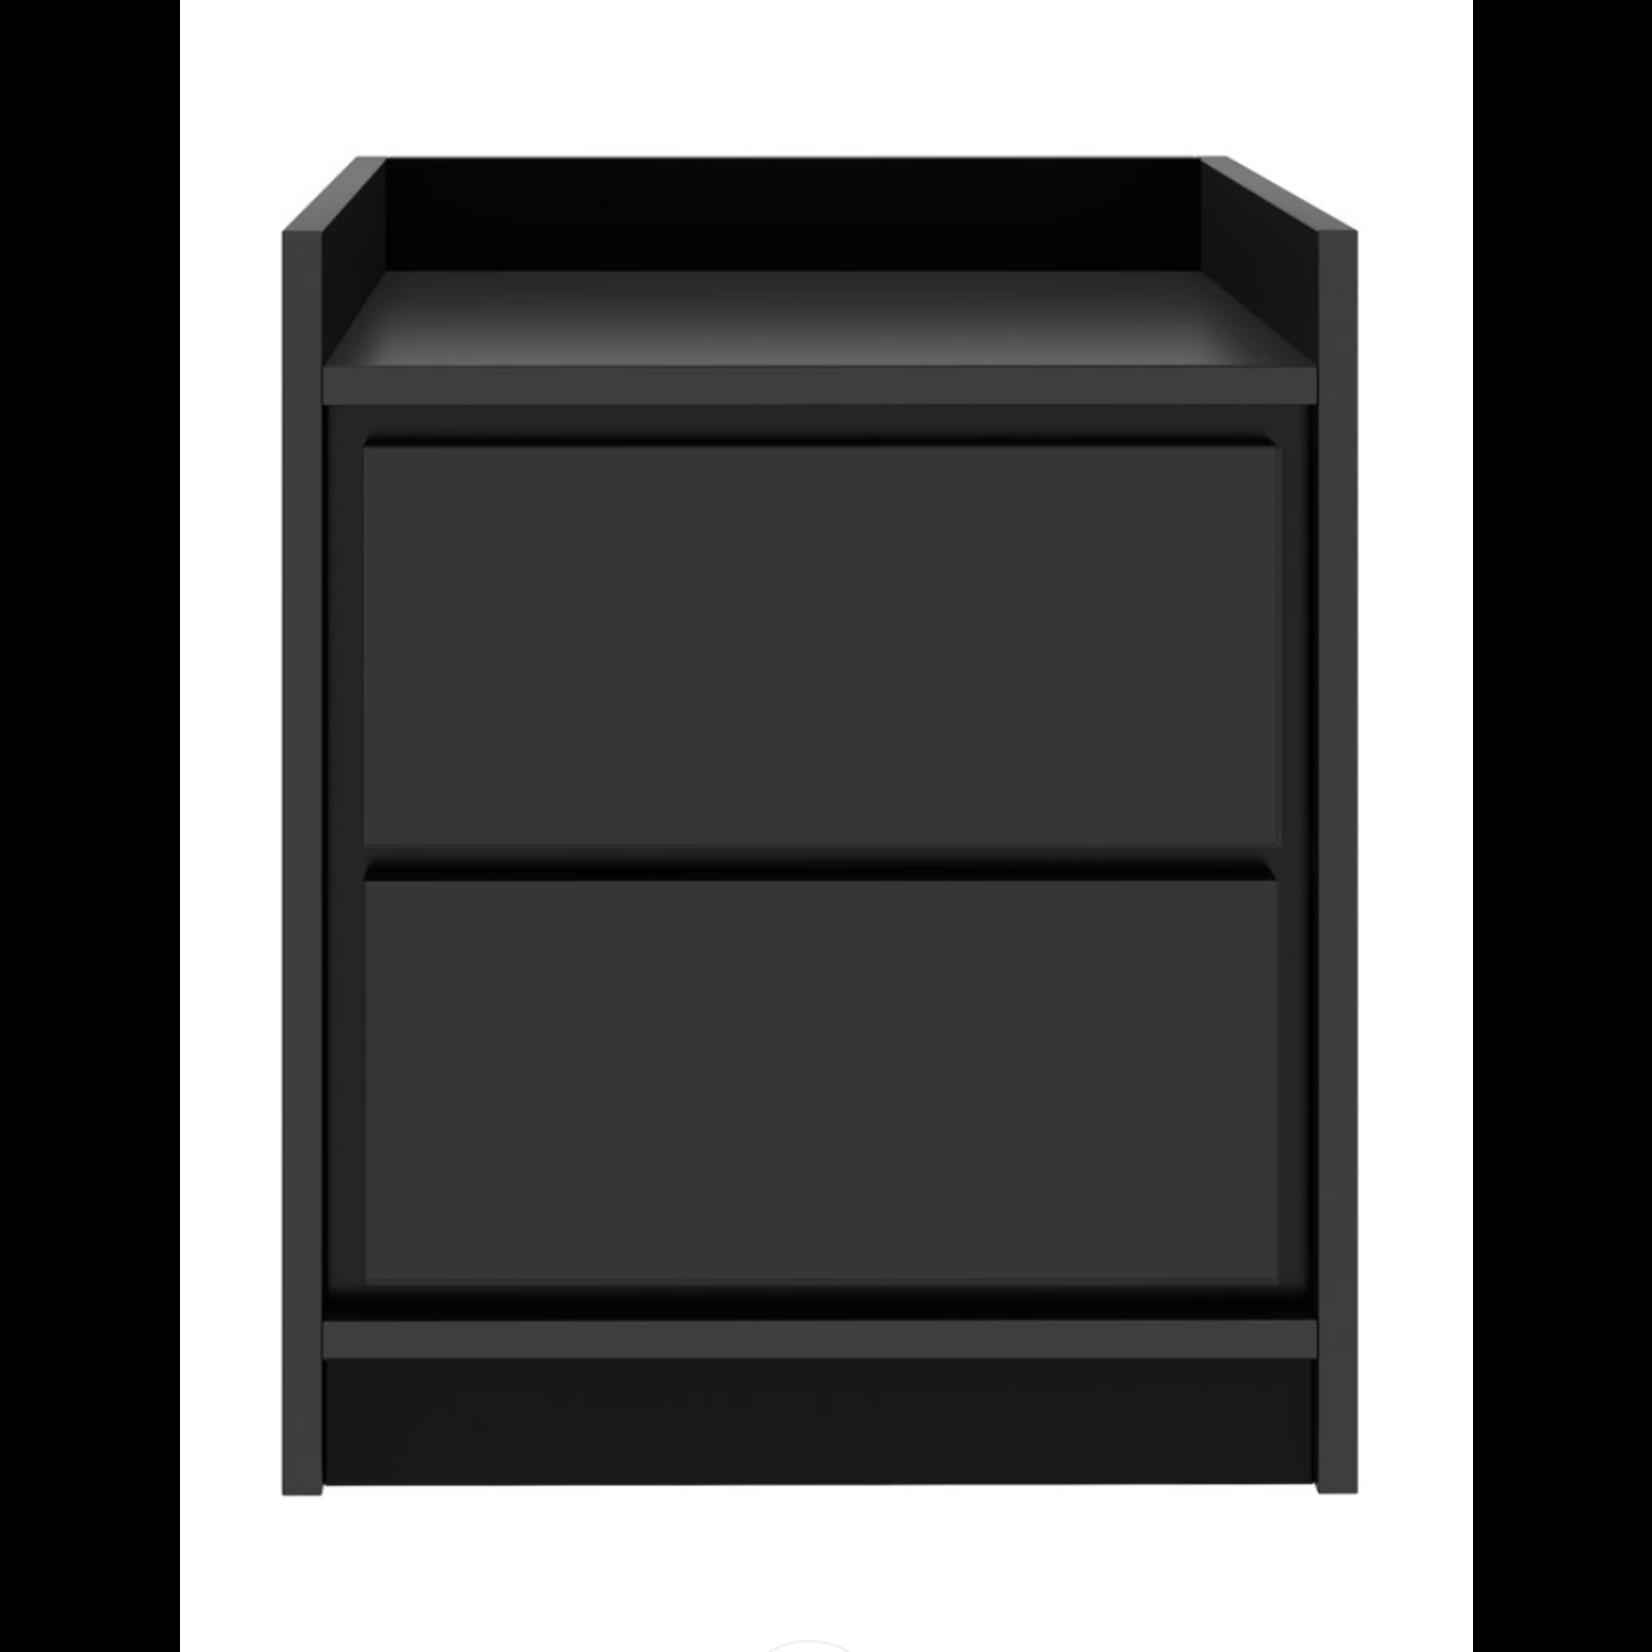 *Inia Low Profile Nightstand - Black